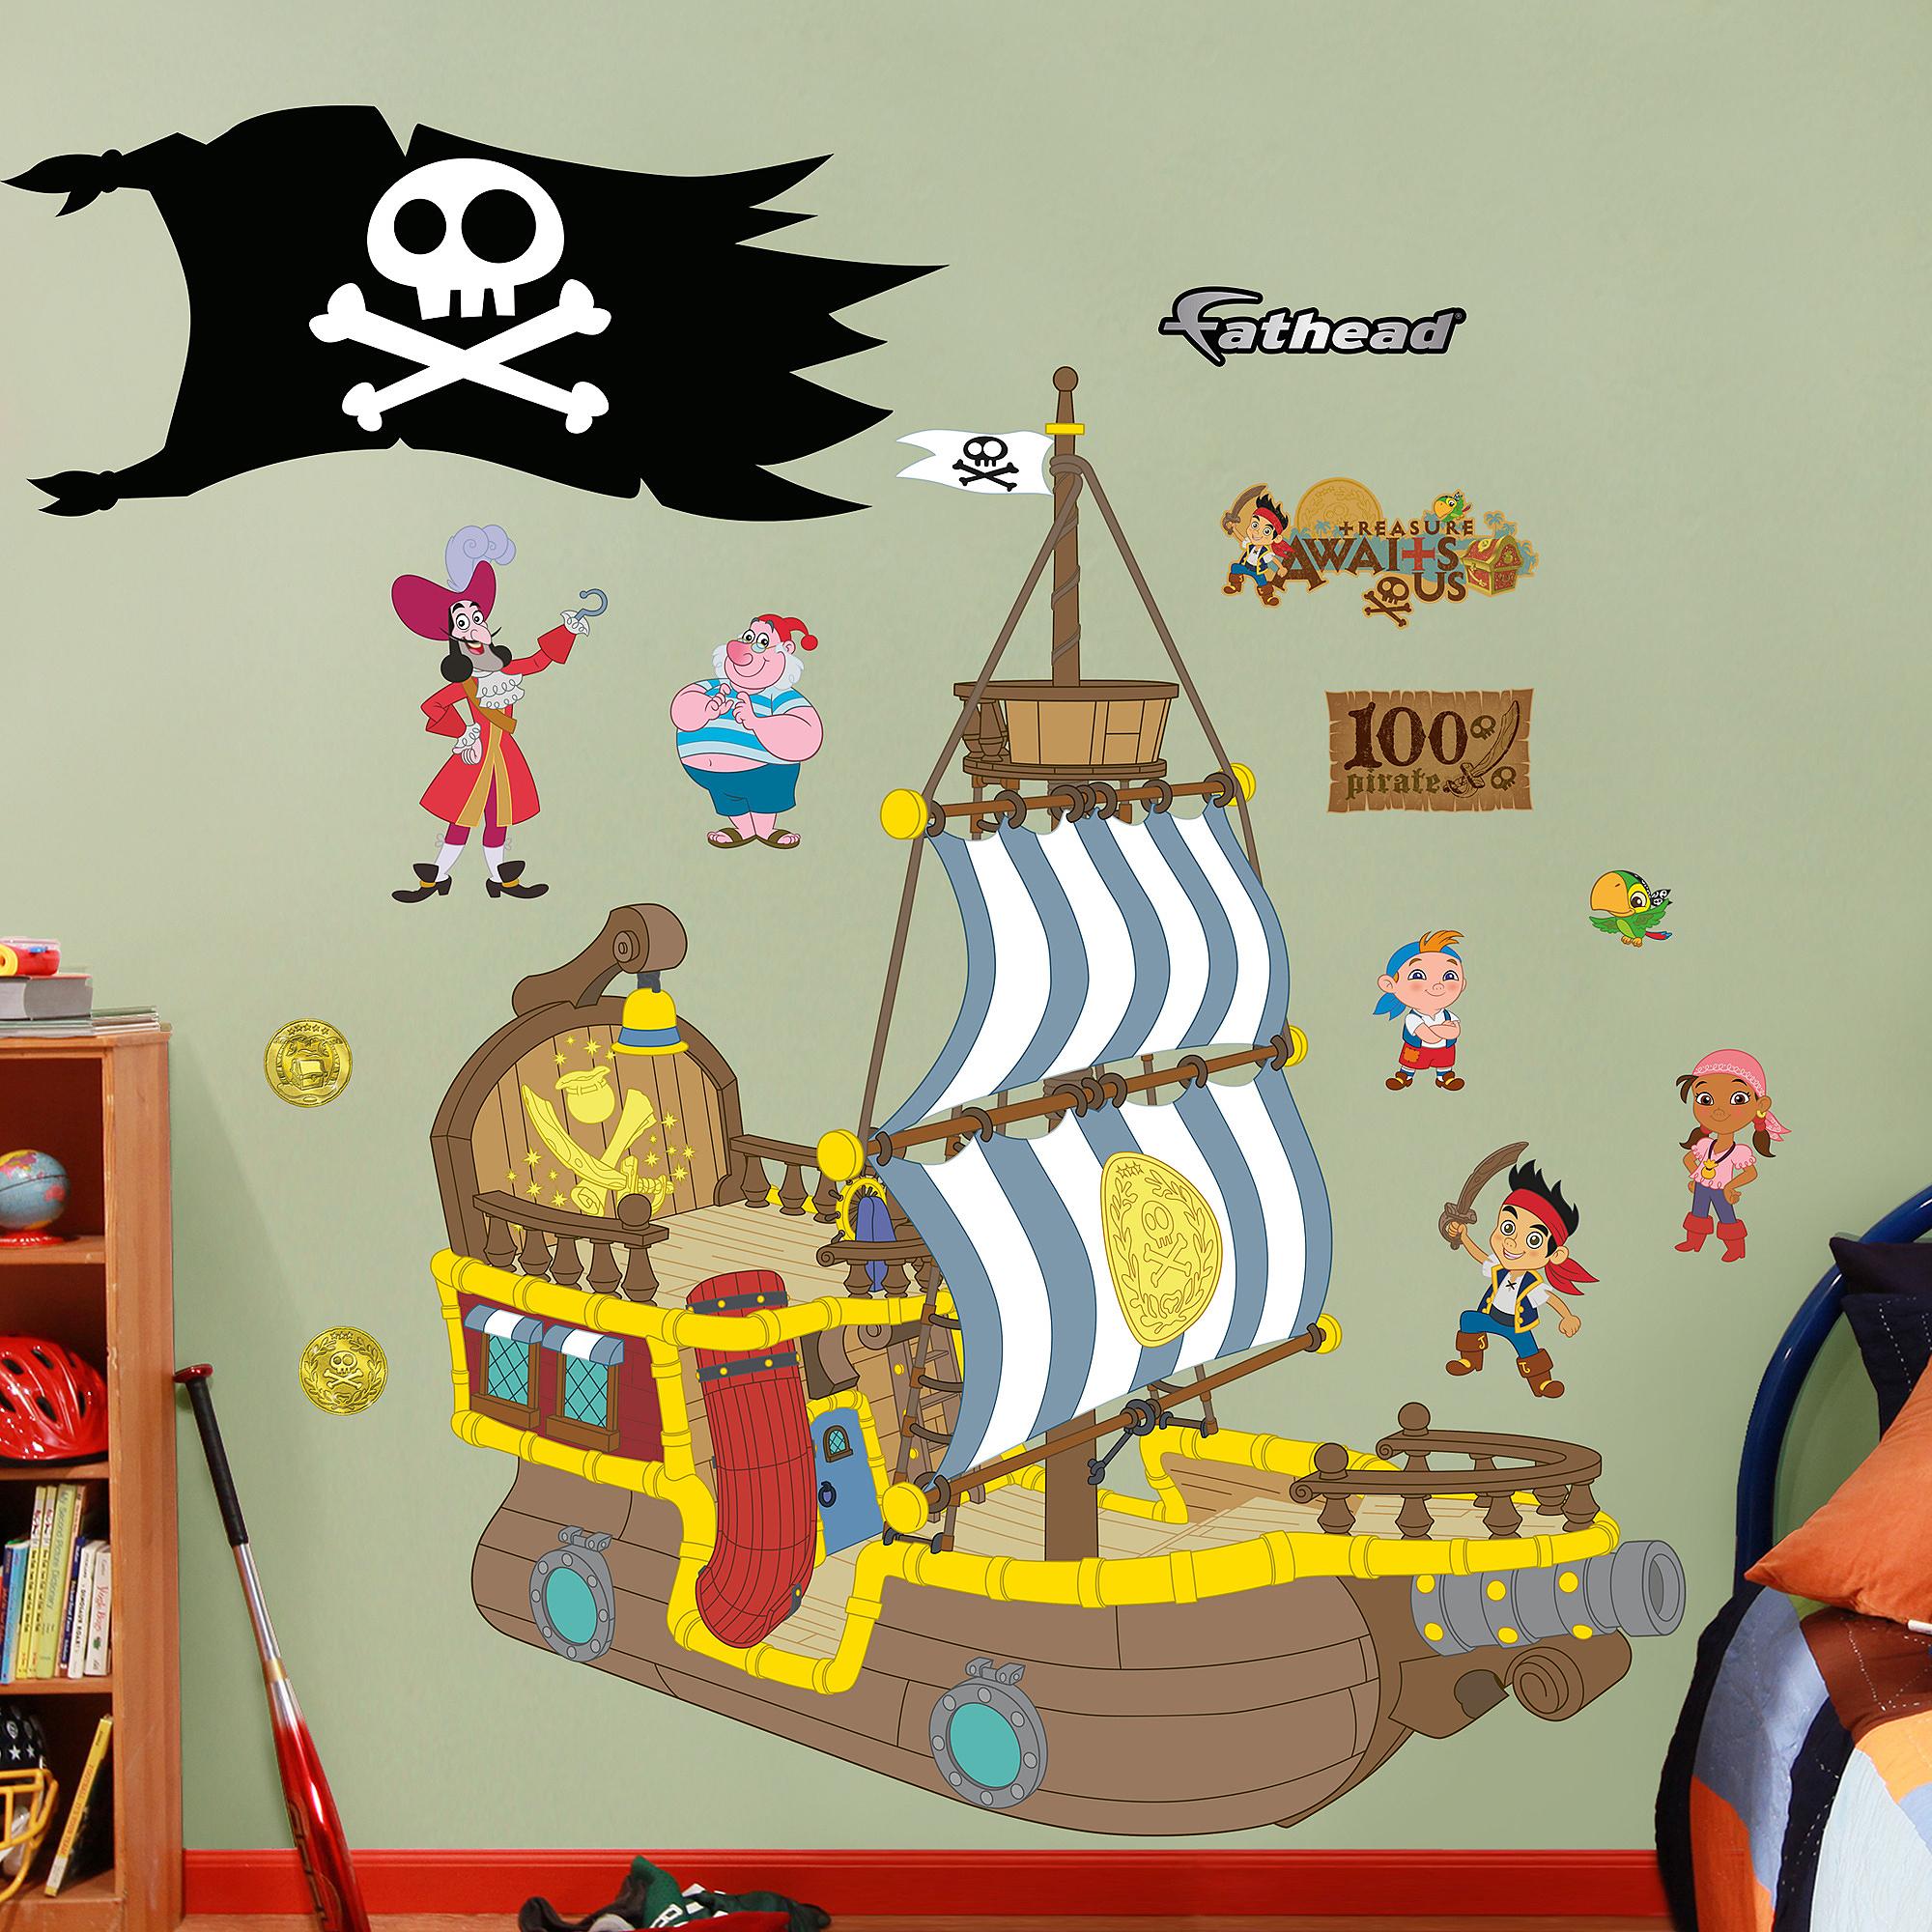 Disney Jake & the Neverland Pirates Bucky Pirate Ship RealBig Fathead